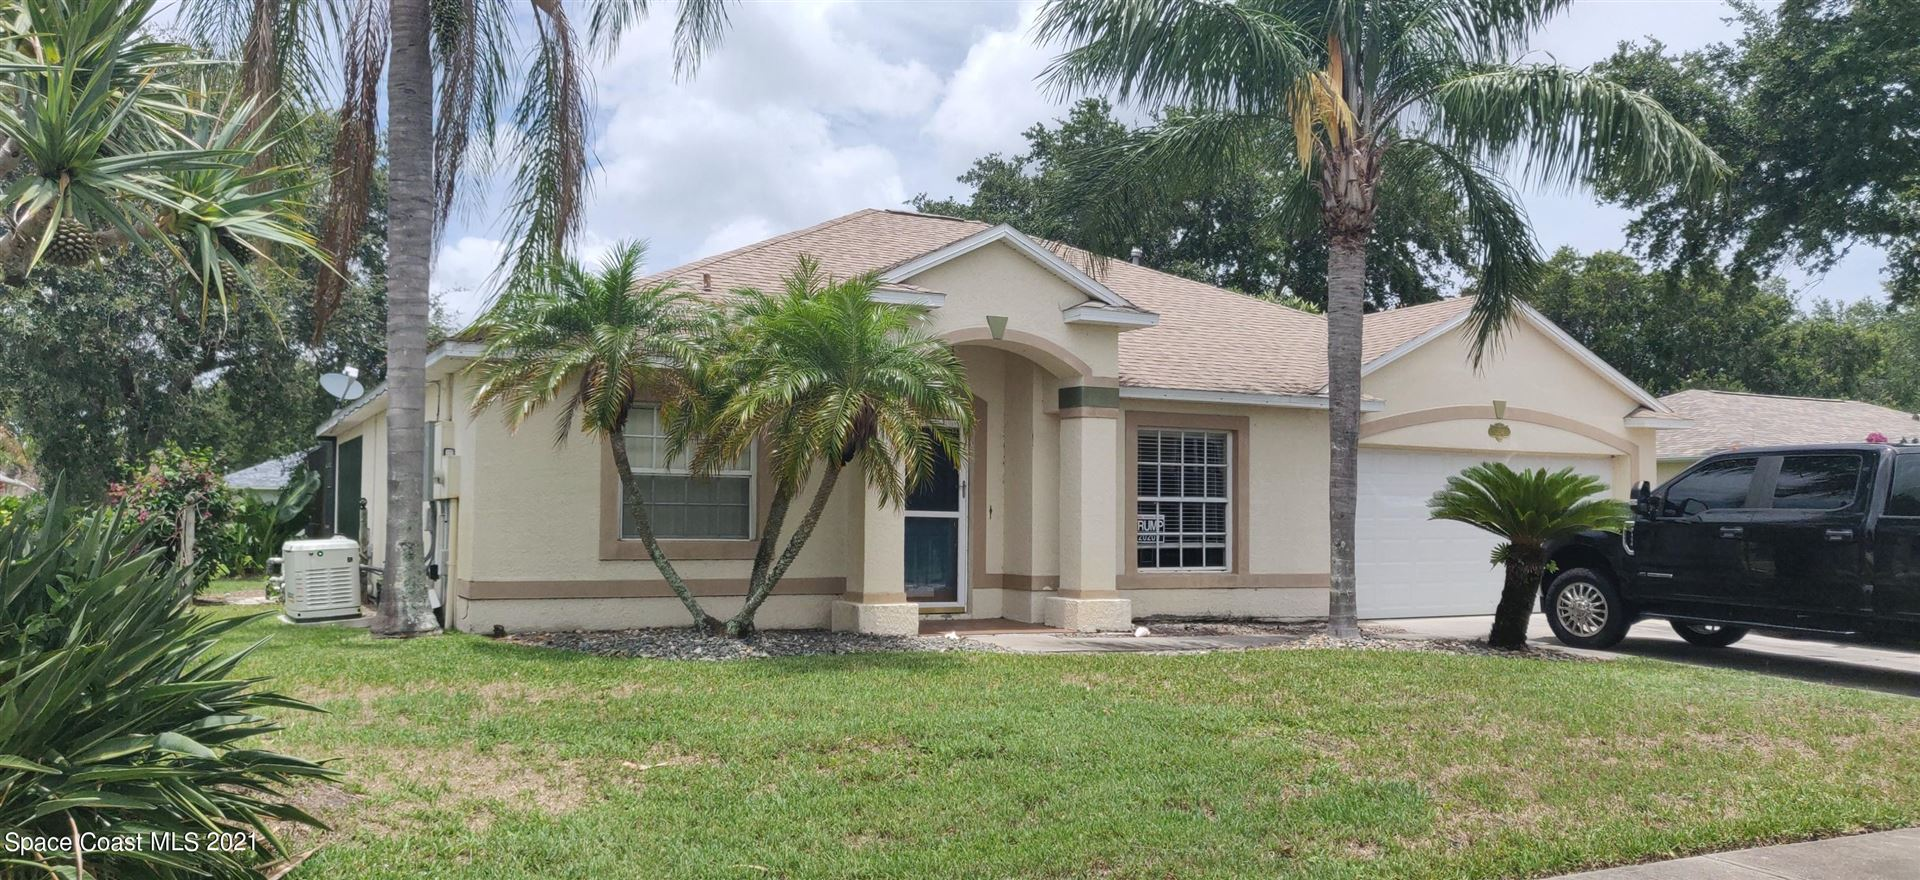 1204 Walnut Grove Way, Rockledge, FL 32955 - #: 908483